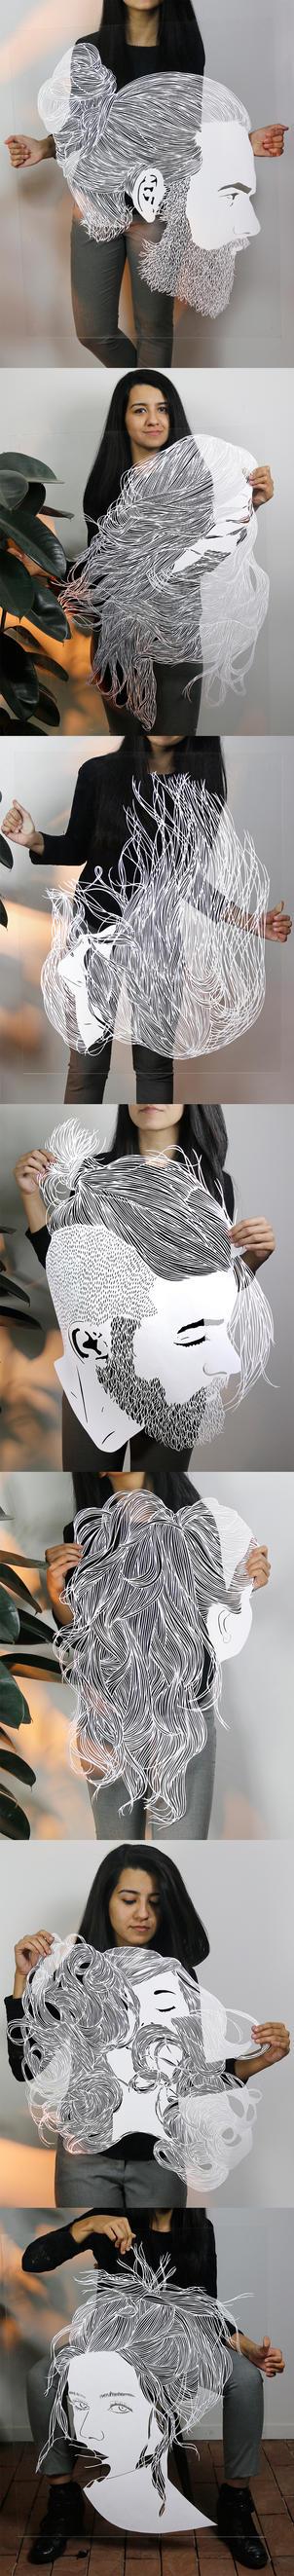 Papercut - Papercutting - Hair - Parthkothekar by ParthKothekar